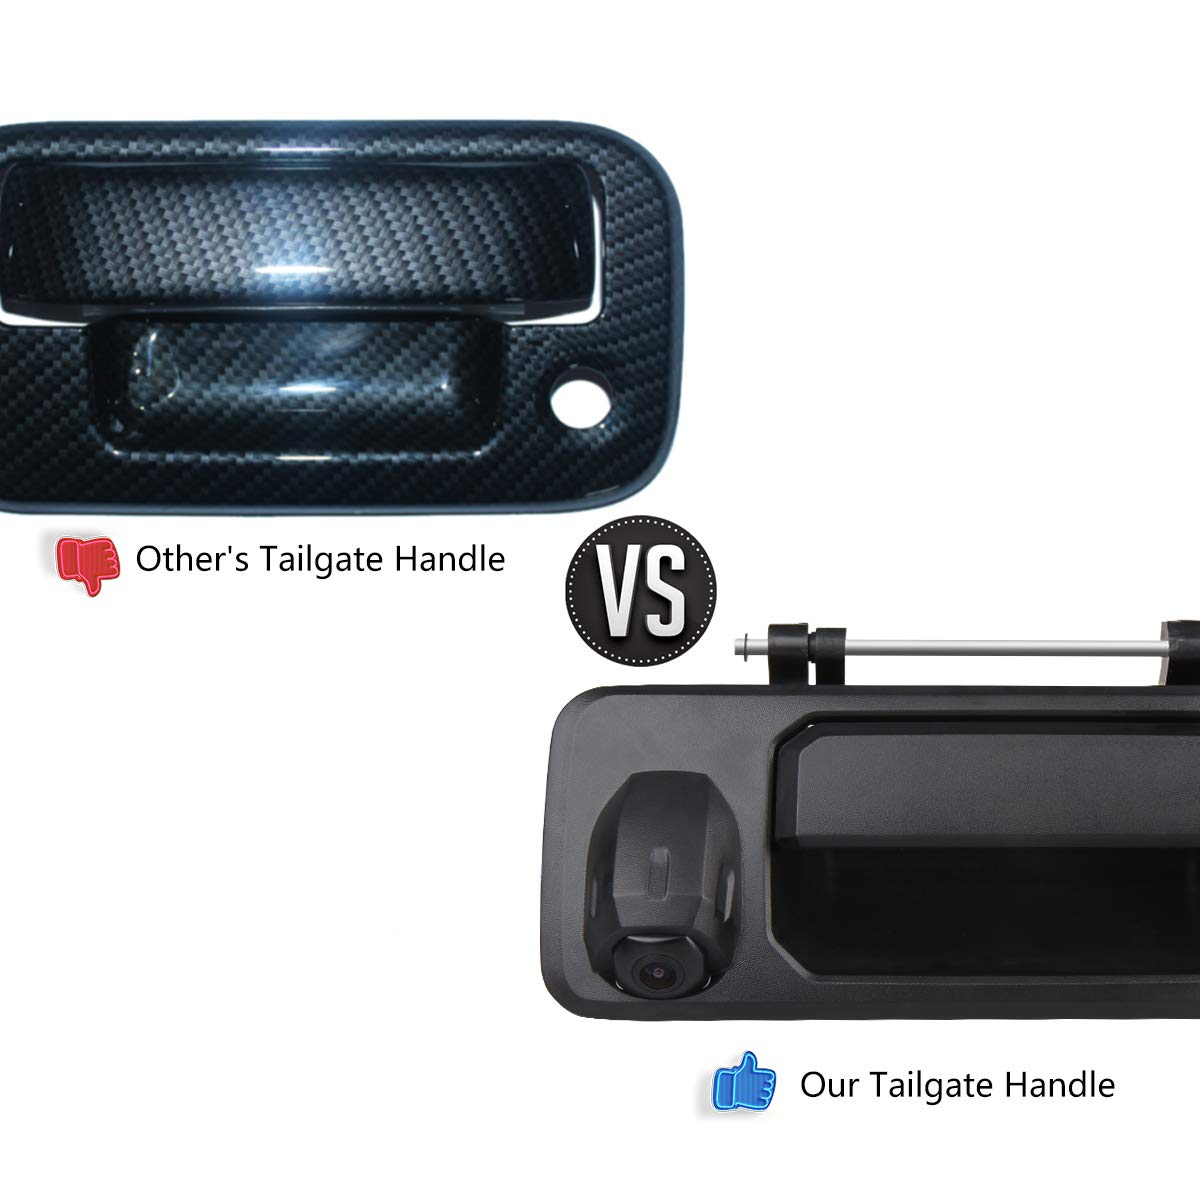 GUANGZHOU STARTWAY AUTOPART Toyota Tacoma Tailgate Cameras CAR ROVER Reverse Reversing Rear View Cameras for Toyota Tacoma 2016-2018 Tailgate Handle Backup Camera Black, 1 Pack